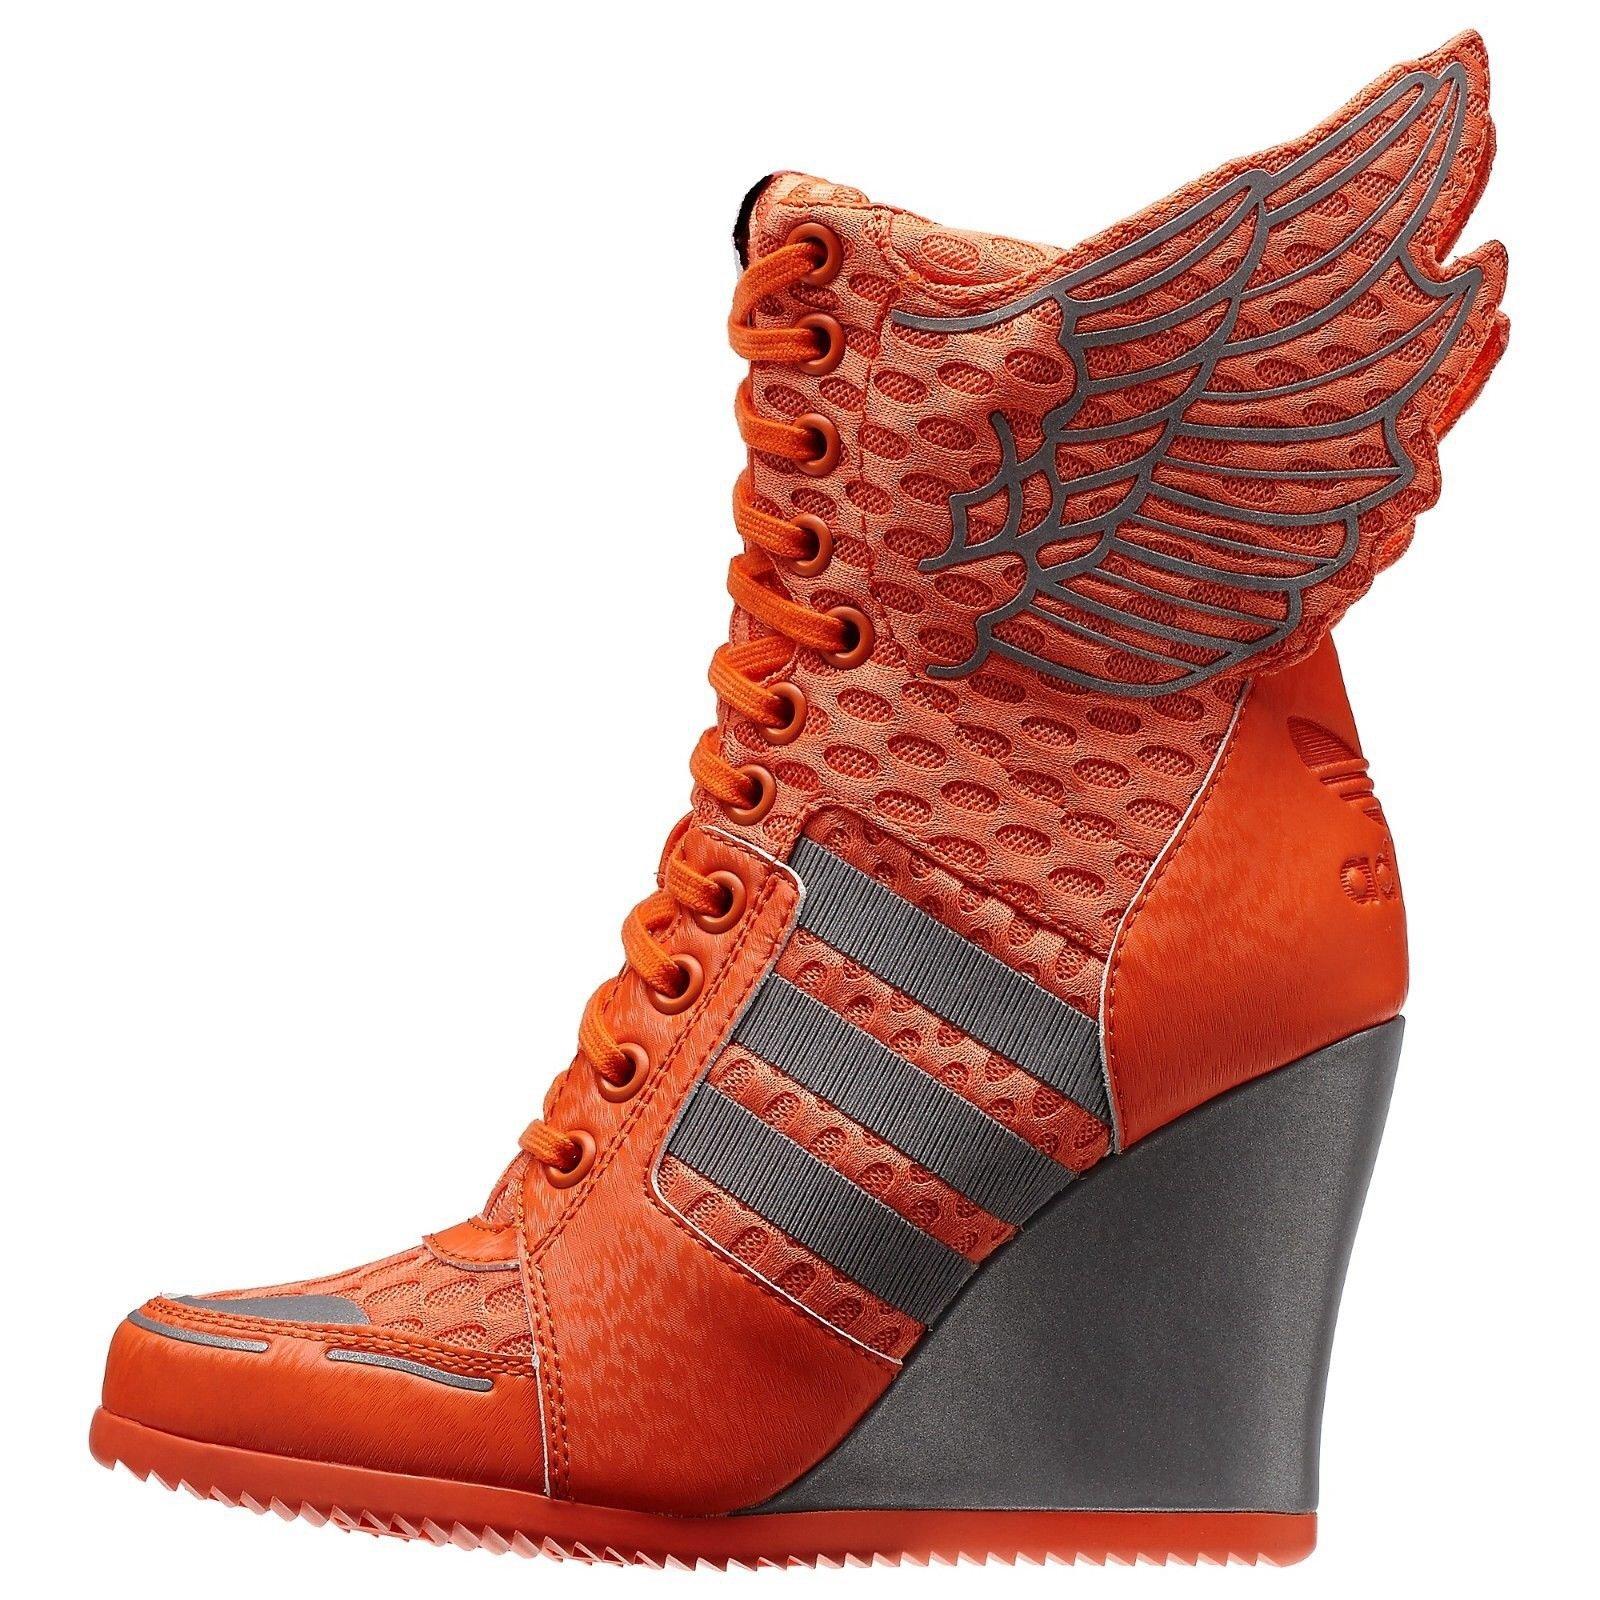 8fb5d5431af1 Galleon - Adidas Originals ObyO Jeremy Scott JS Athletic Wings Wedge Orange  D65703 Women s Boots (Size 8)